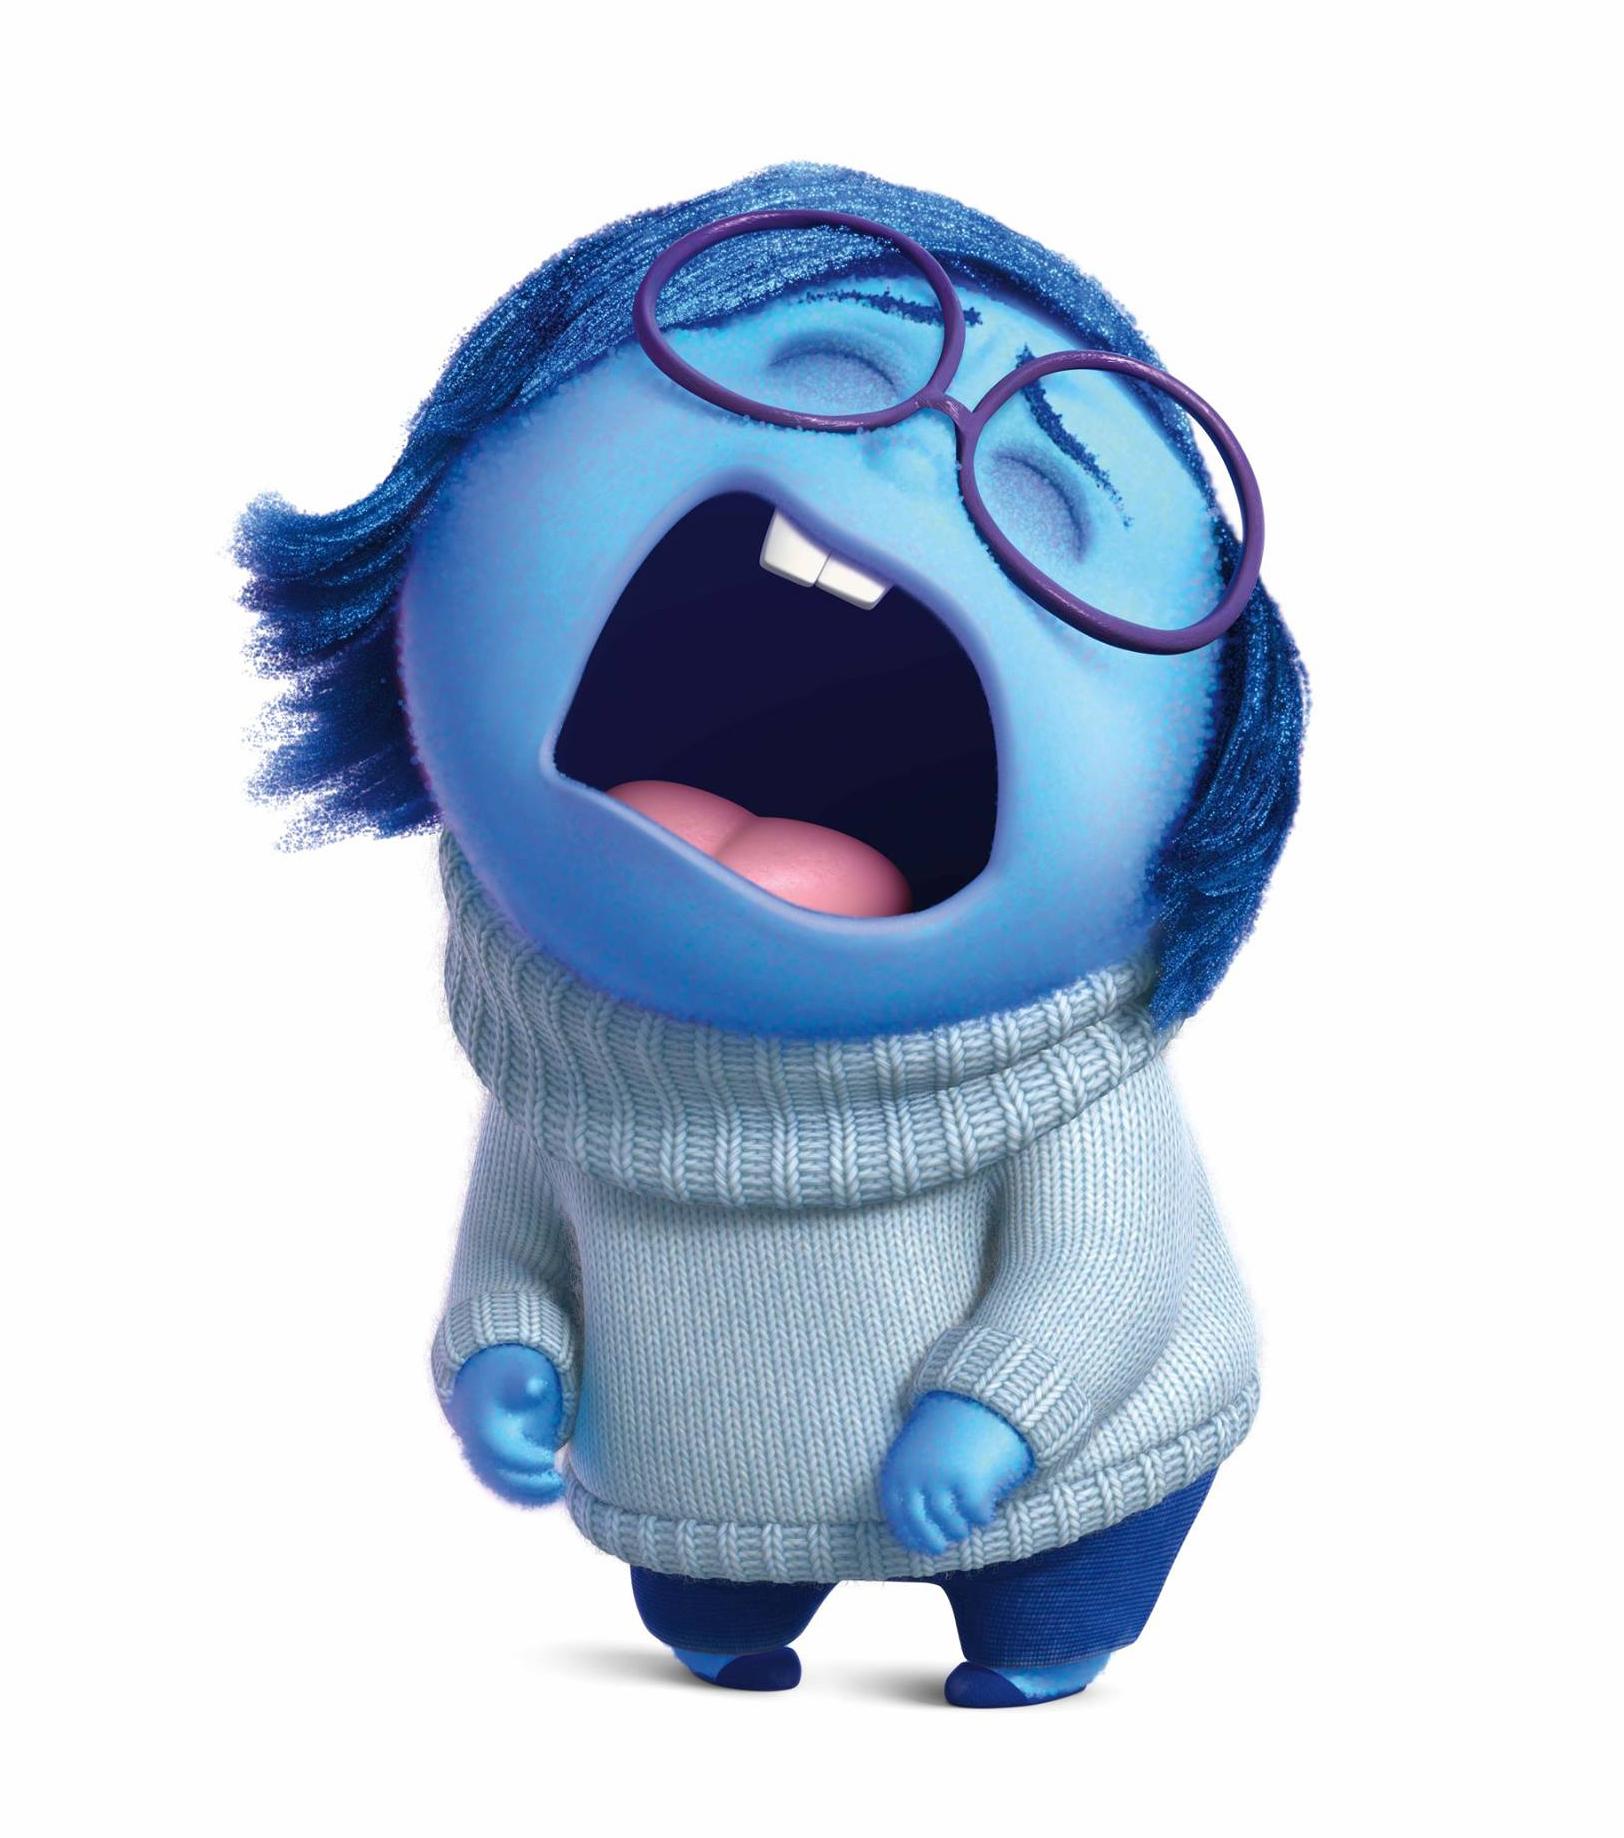 Image - Inside-Out-bigcry-Sadness.jpg | Pixar Wiki | FANDOM powered ...